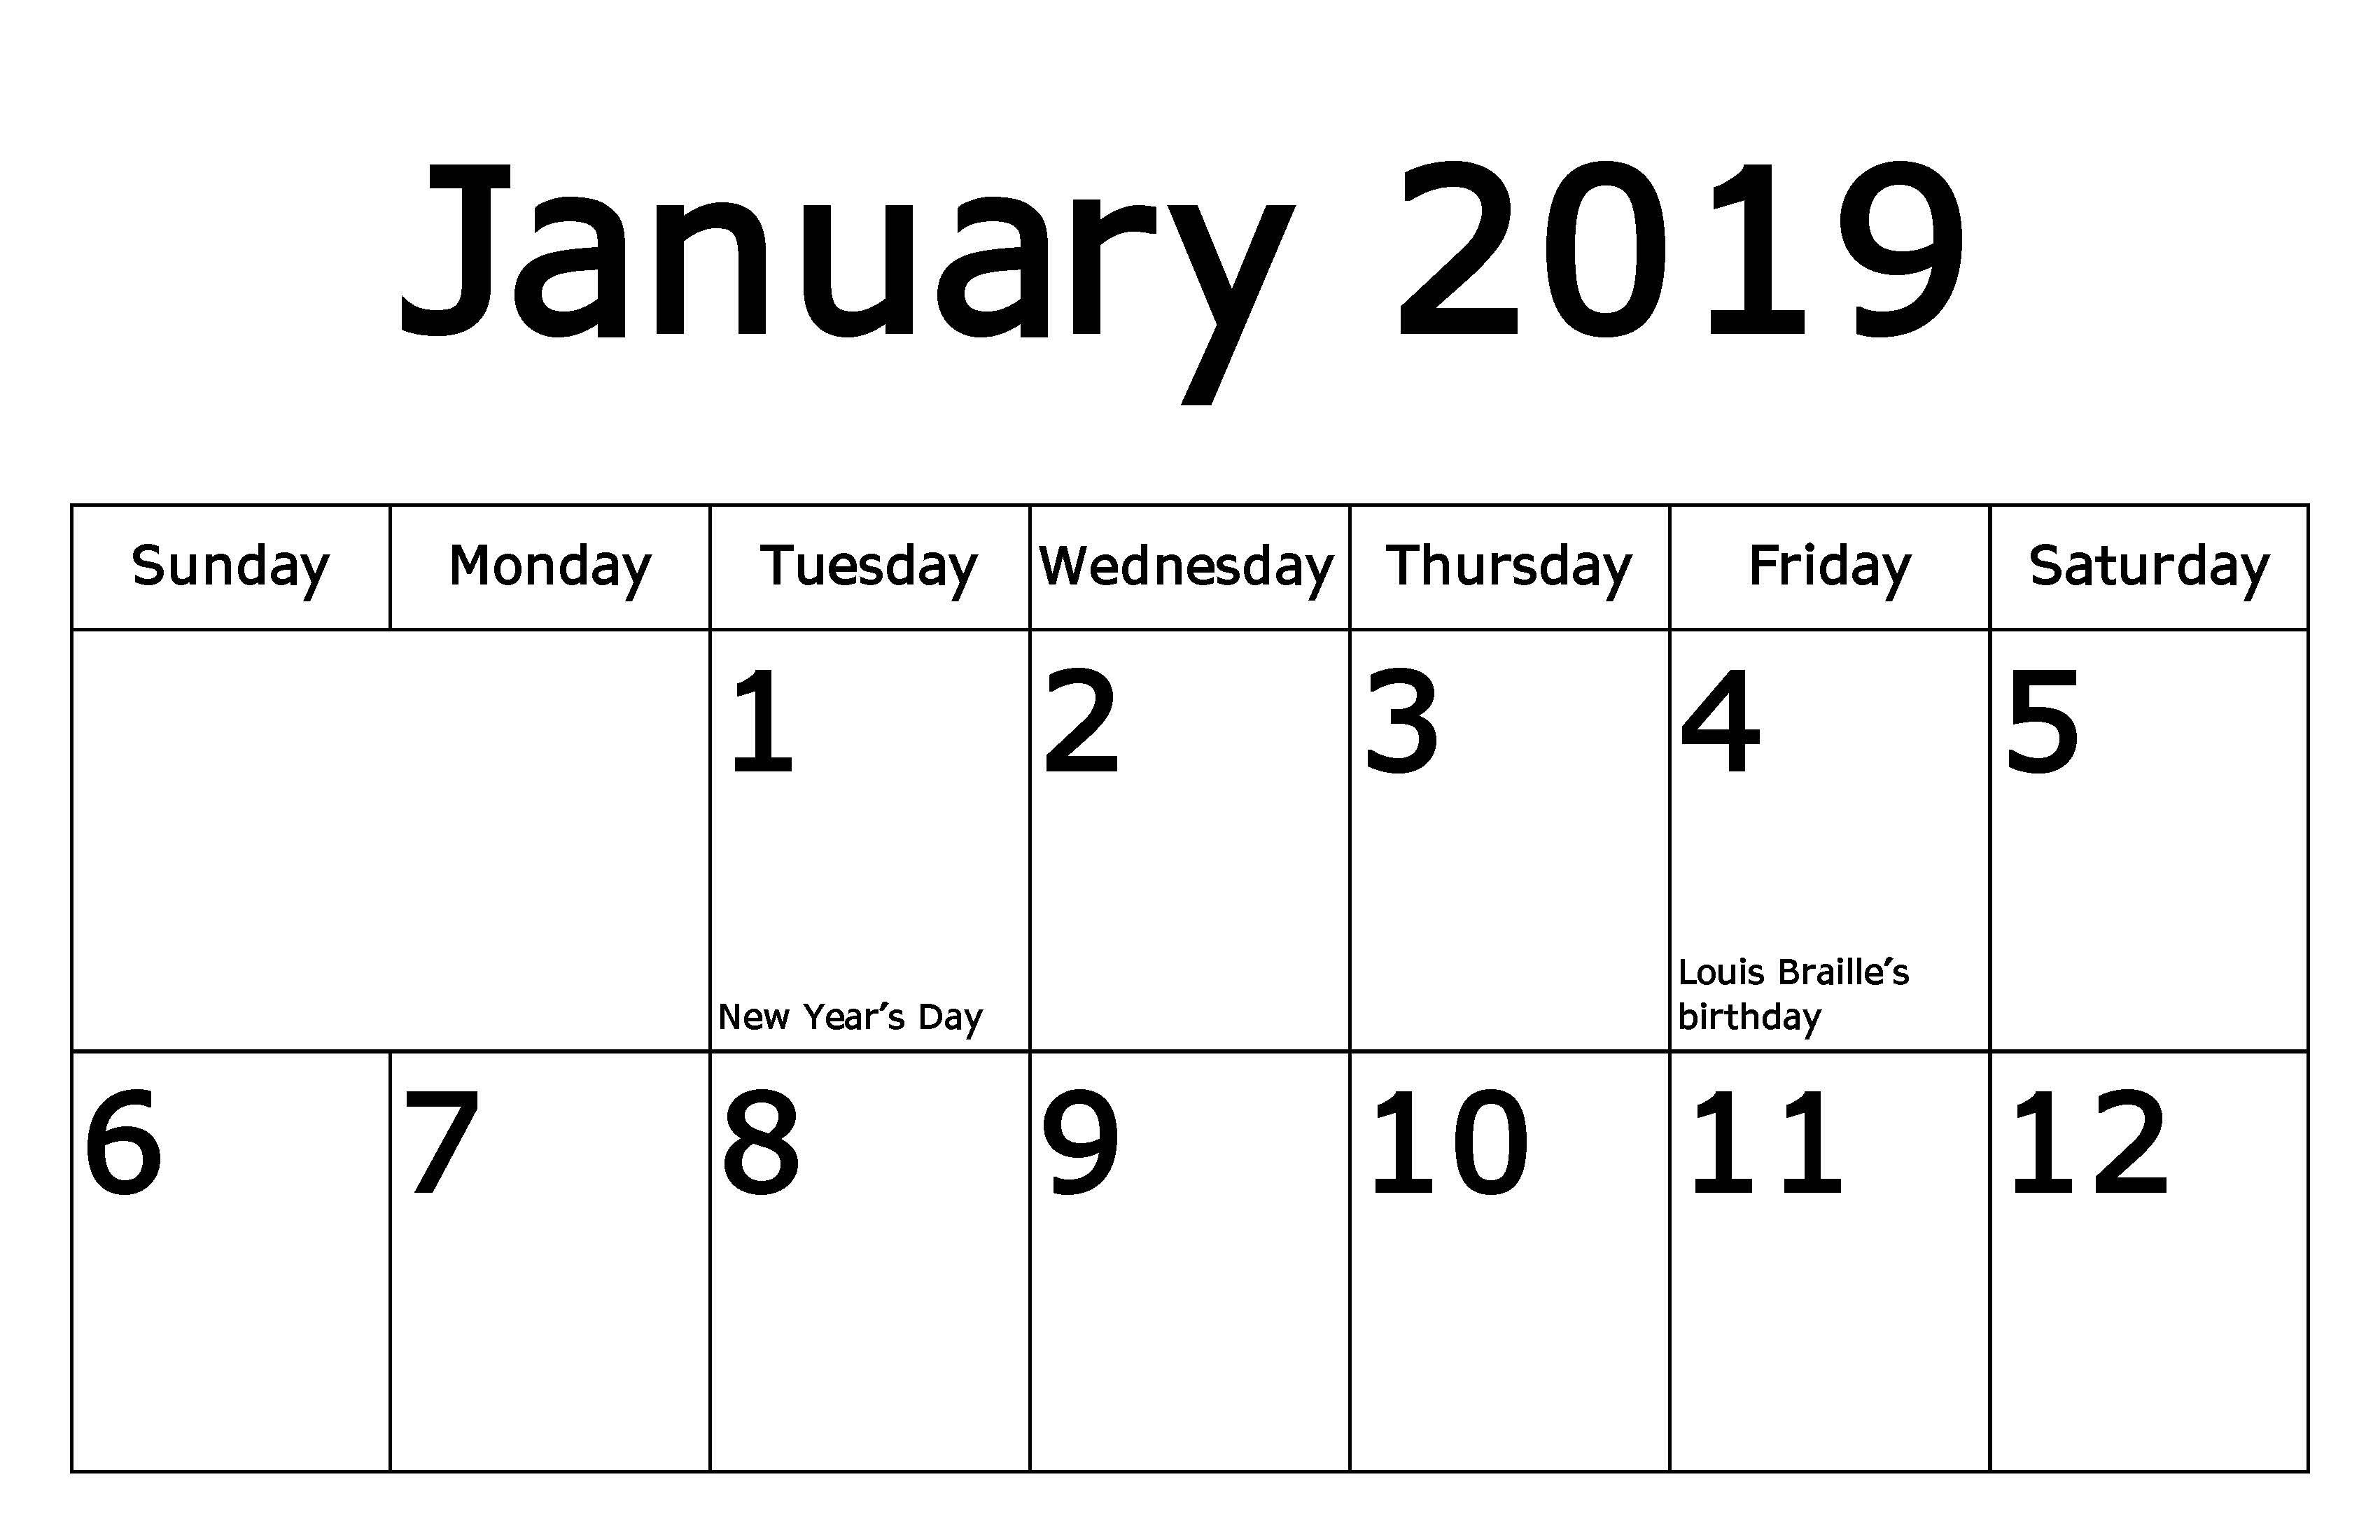 Large Print Calendar 2019 2019 large print calendars – New Vision for Independence